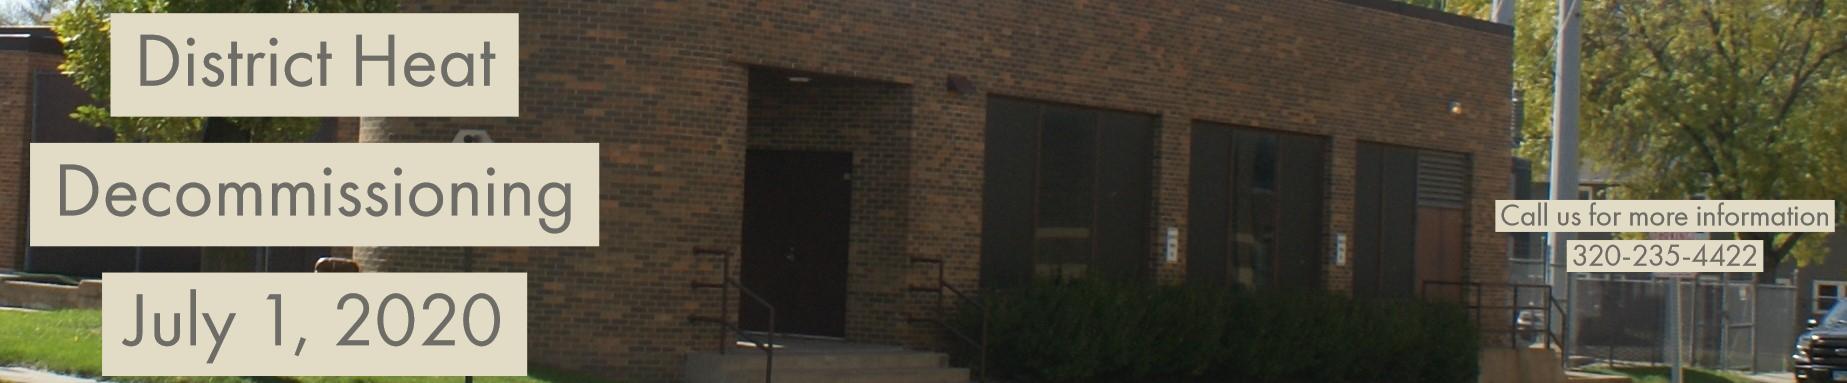 District Heat Building in Willmar Minnesota